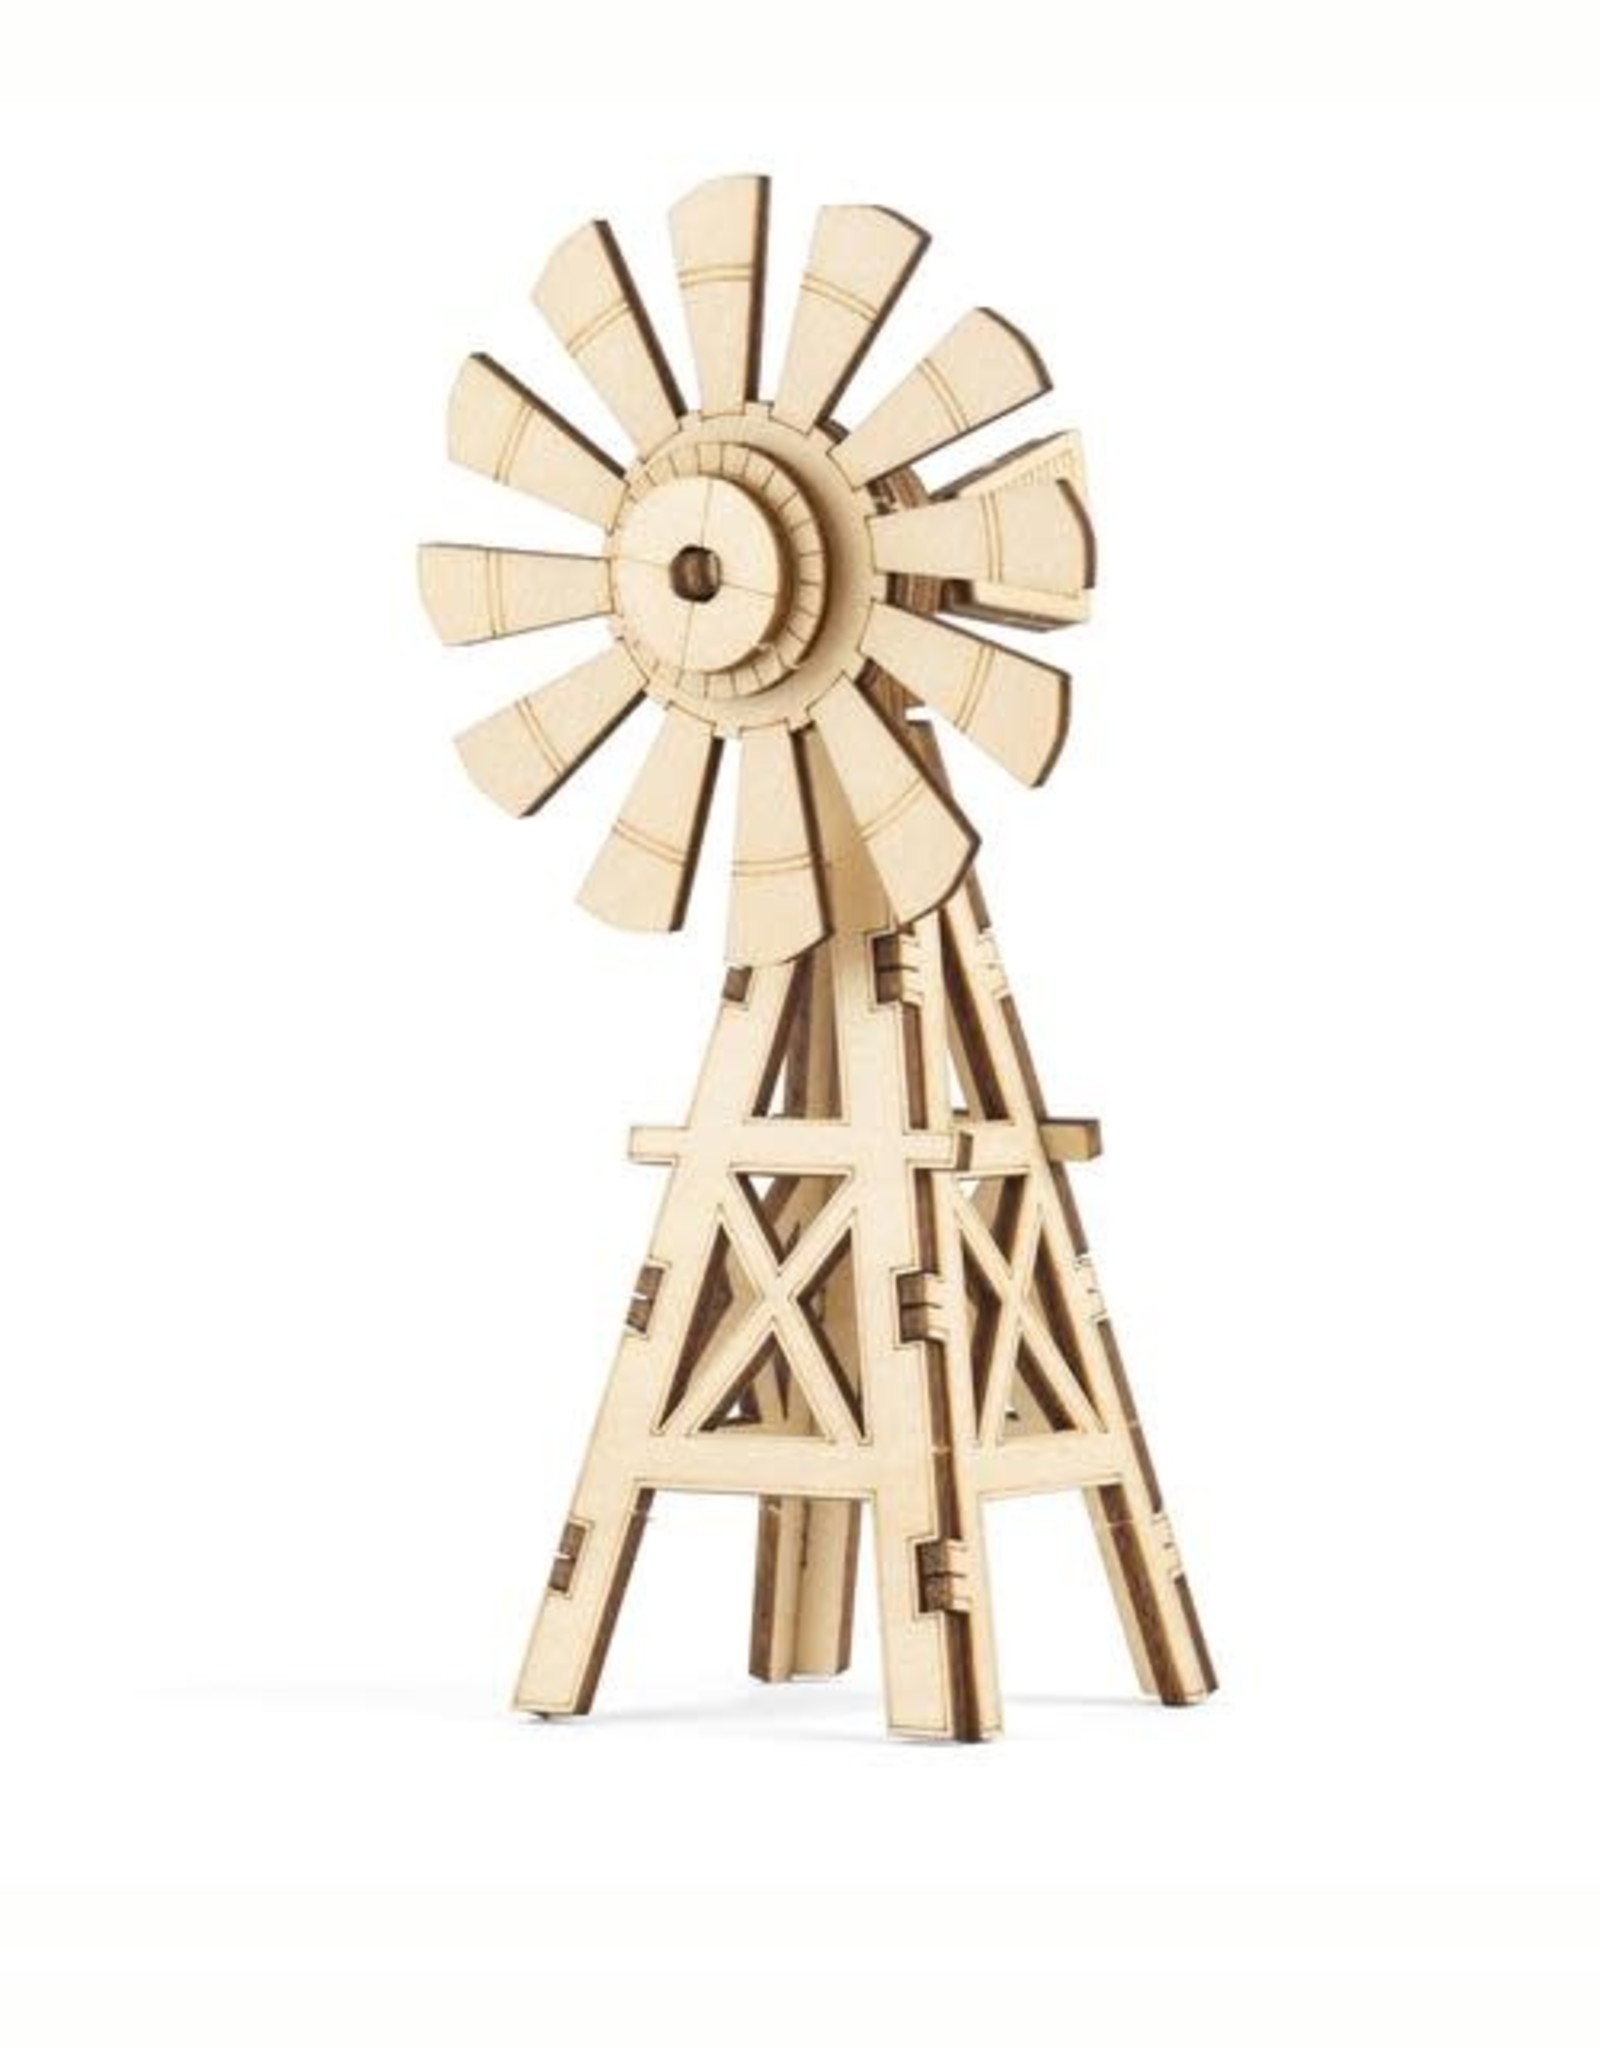 Kikkerland Windmill 3D Wooden Puzzle